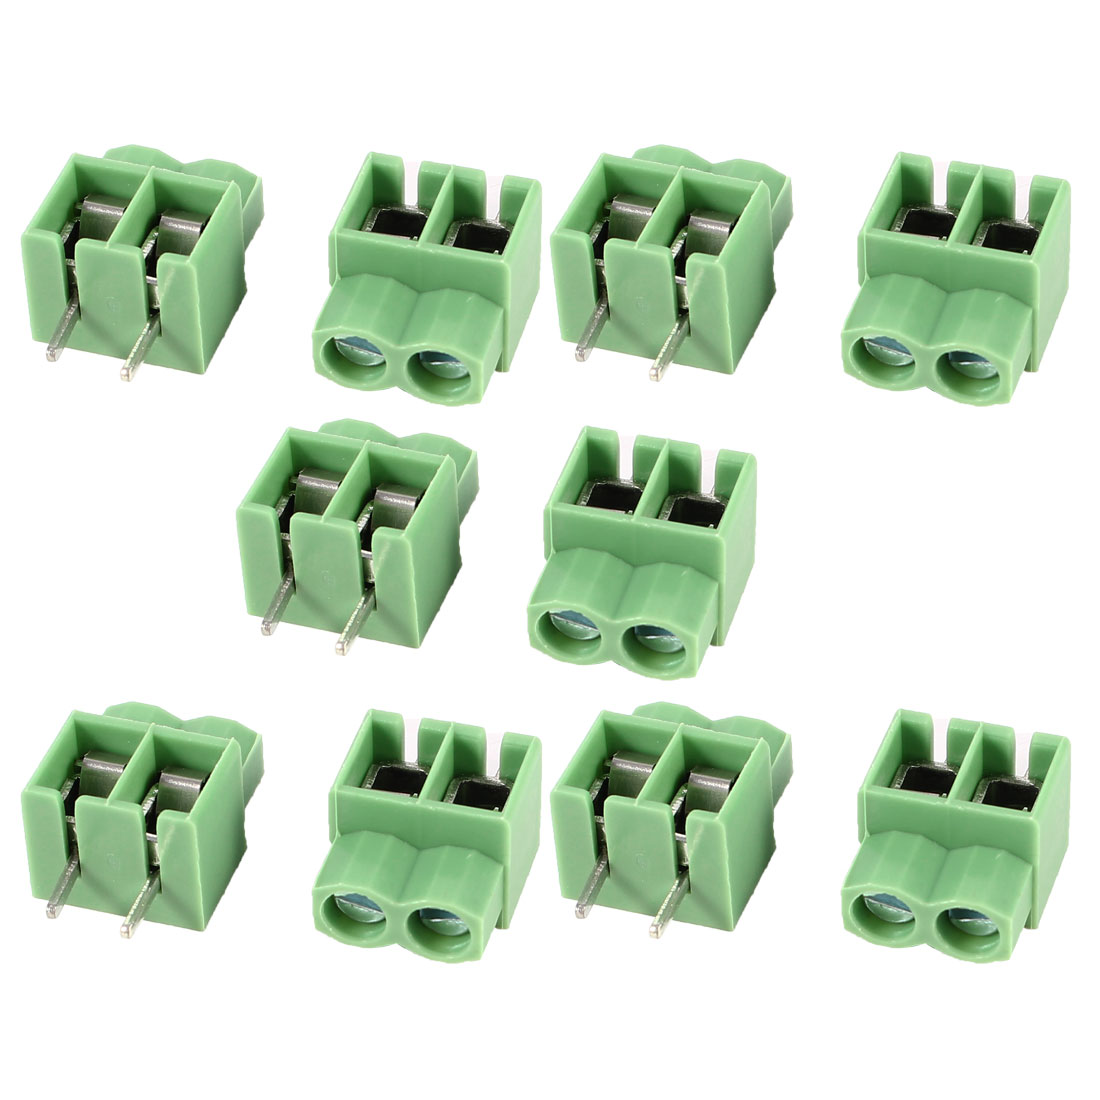 10 Pcs KF166-2P 5mm 2 Pin 2 Position PCB Mount Screw Terminal Blocks 300V 16A